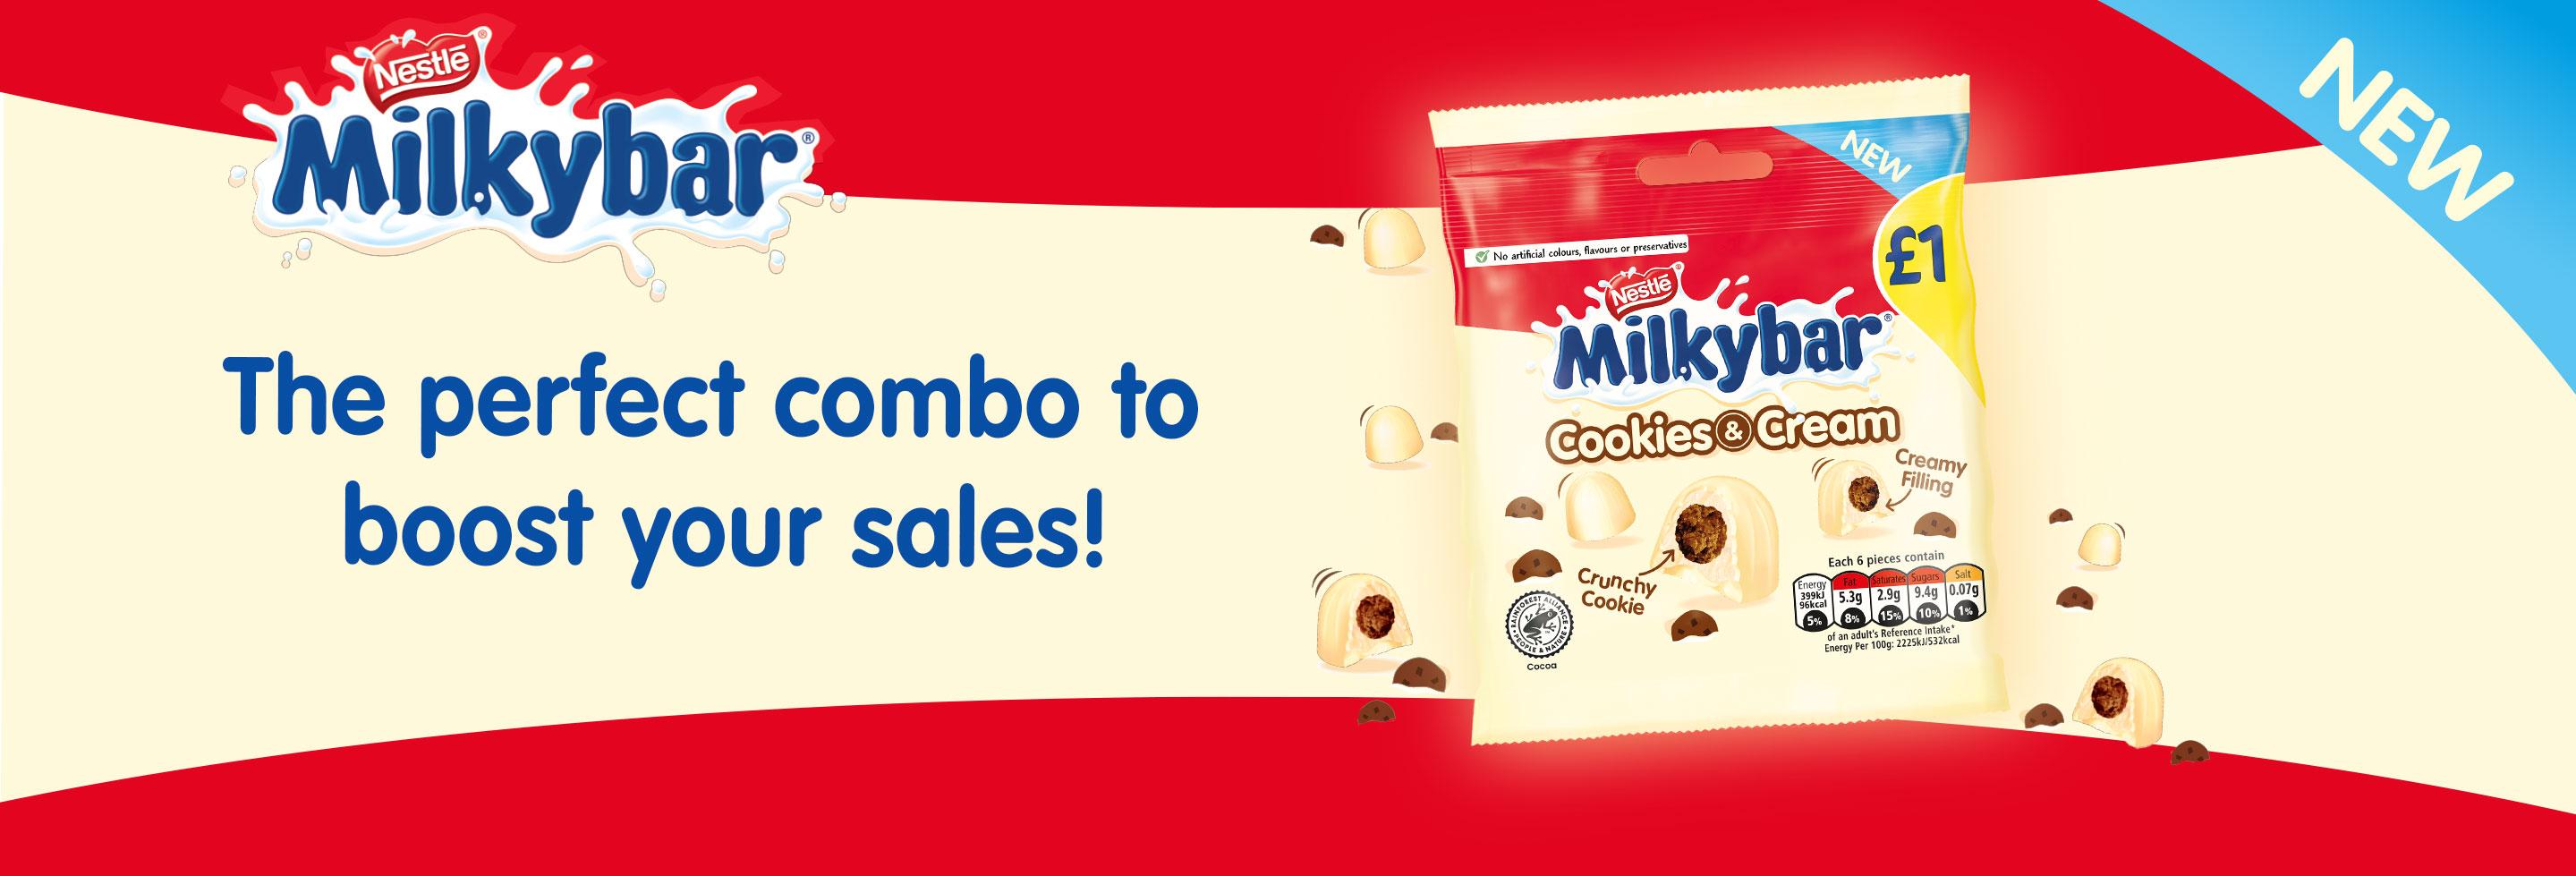 Milkybar Cookies & Cream